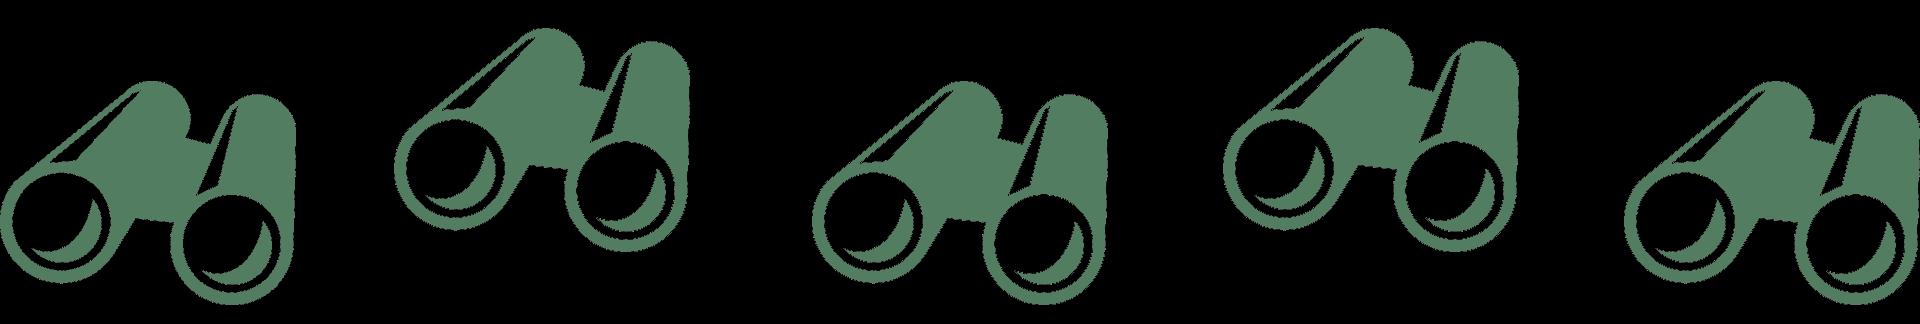 binoculars 2 divider